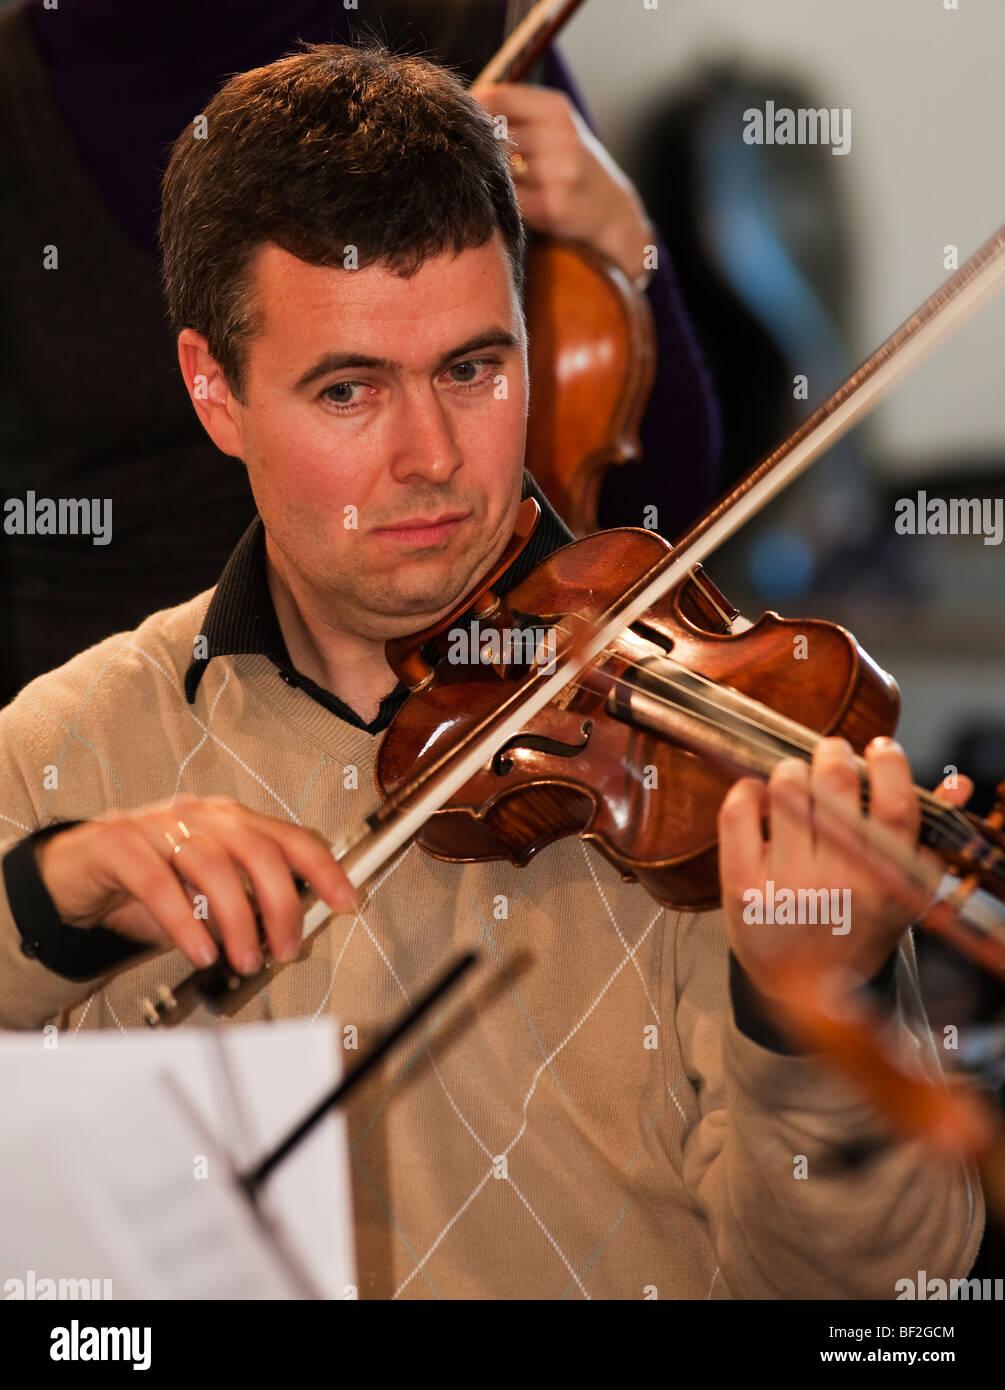 musician violinist string player violin - Stock Image